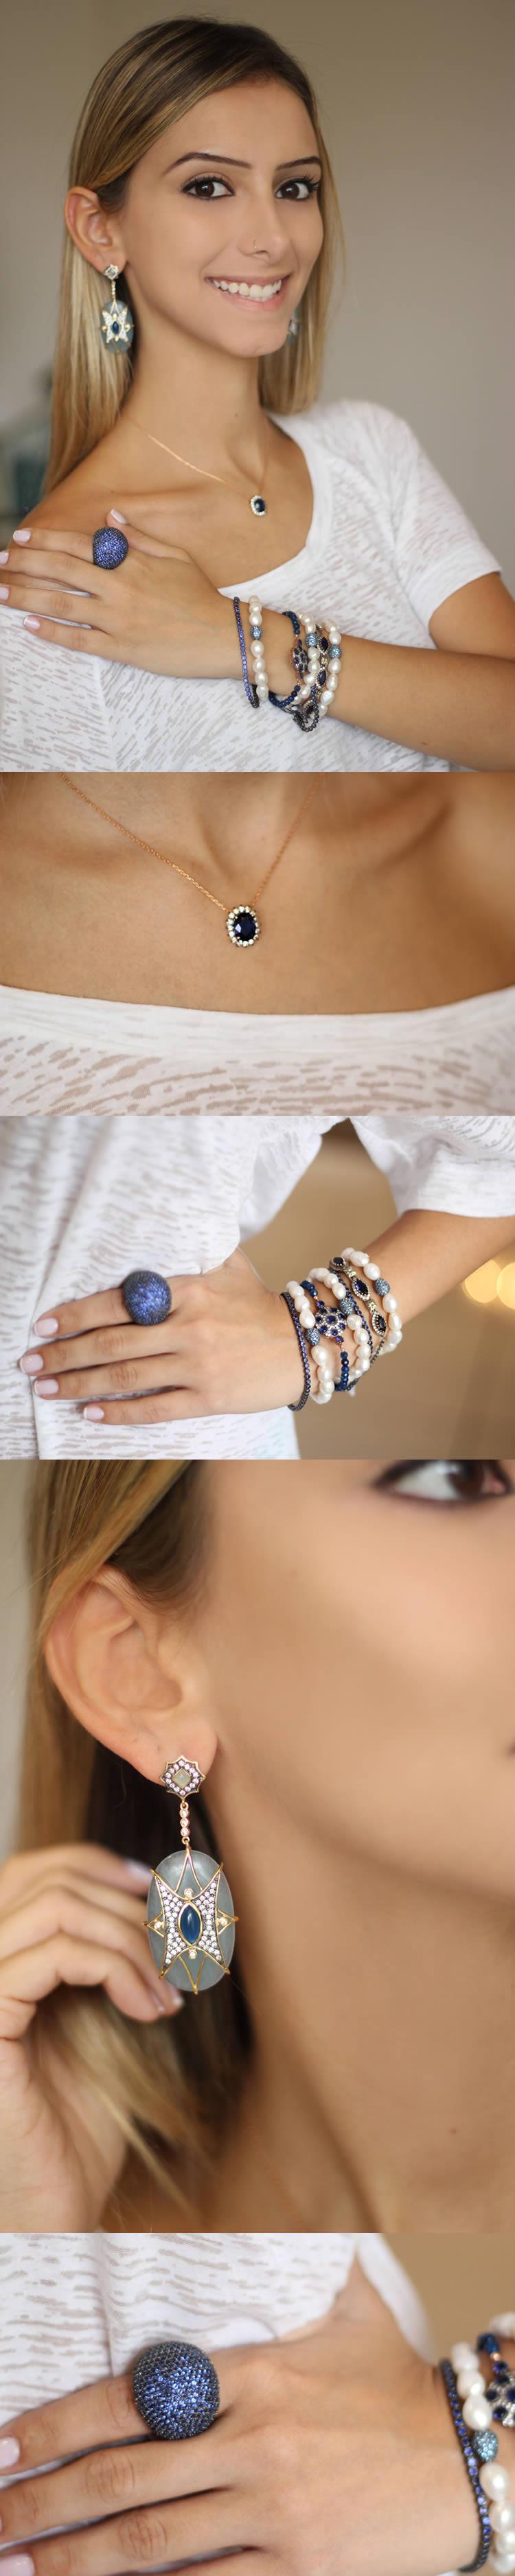 semijoias-clauida-bomtempo-joias-turcas-joias-azul-claro-joias-azul-escuro-pedras-cristais-turquesa